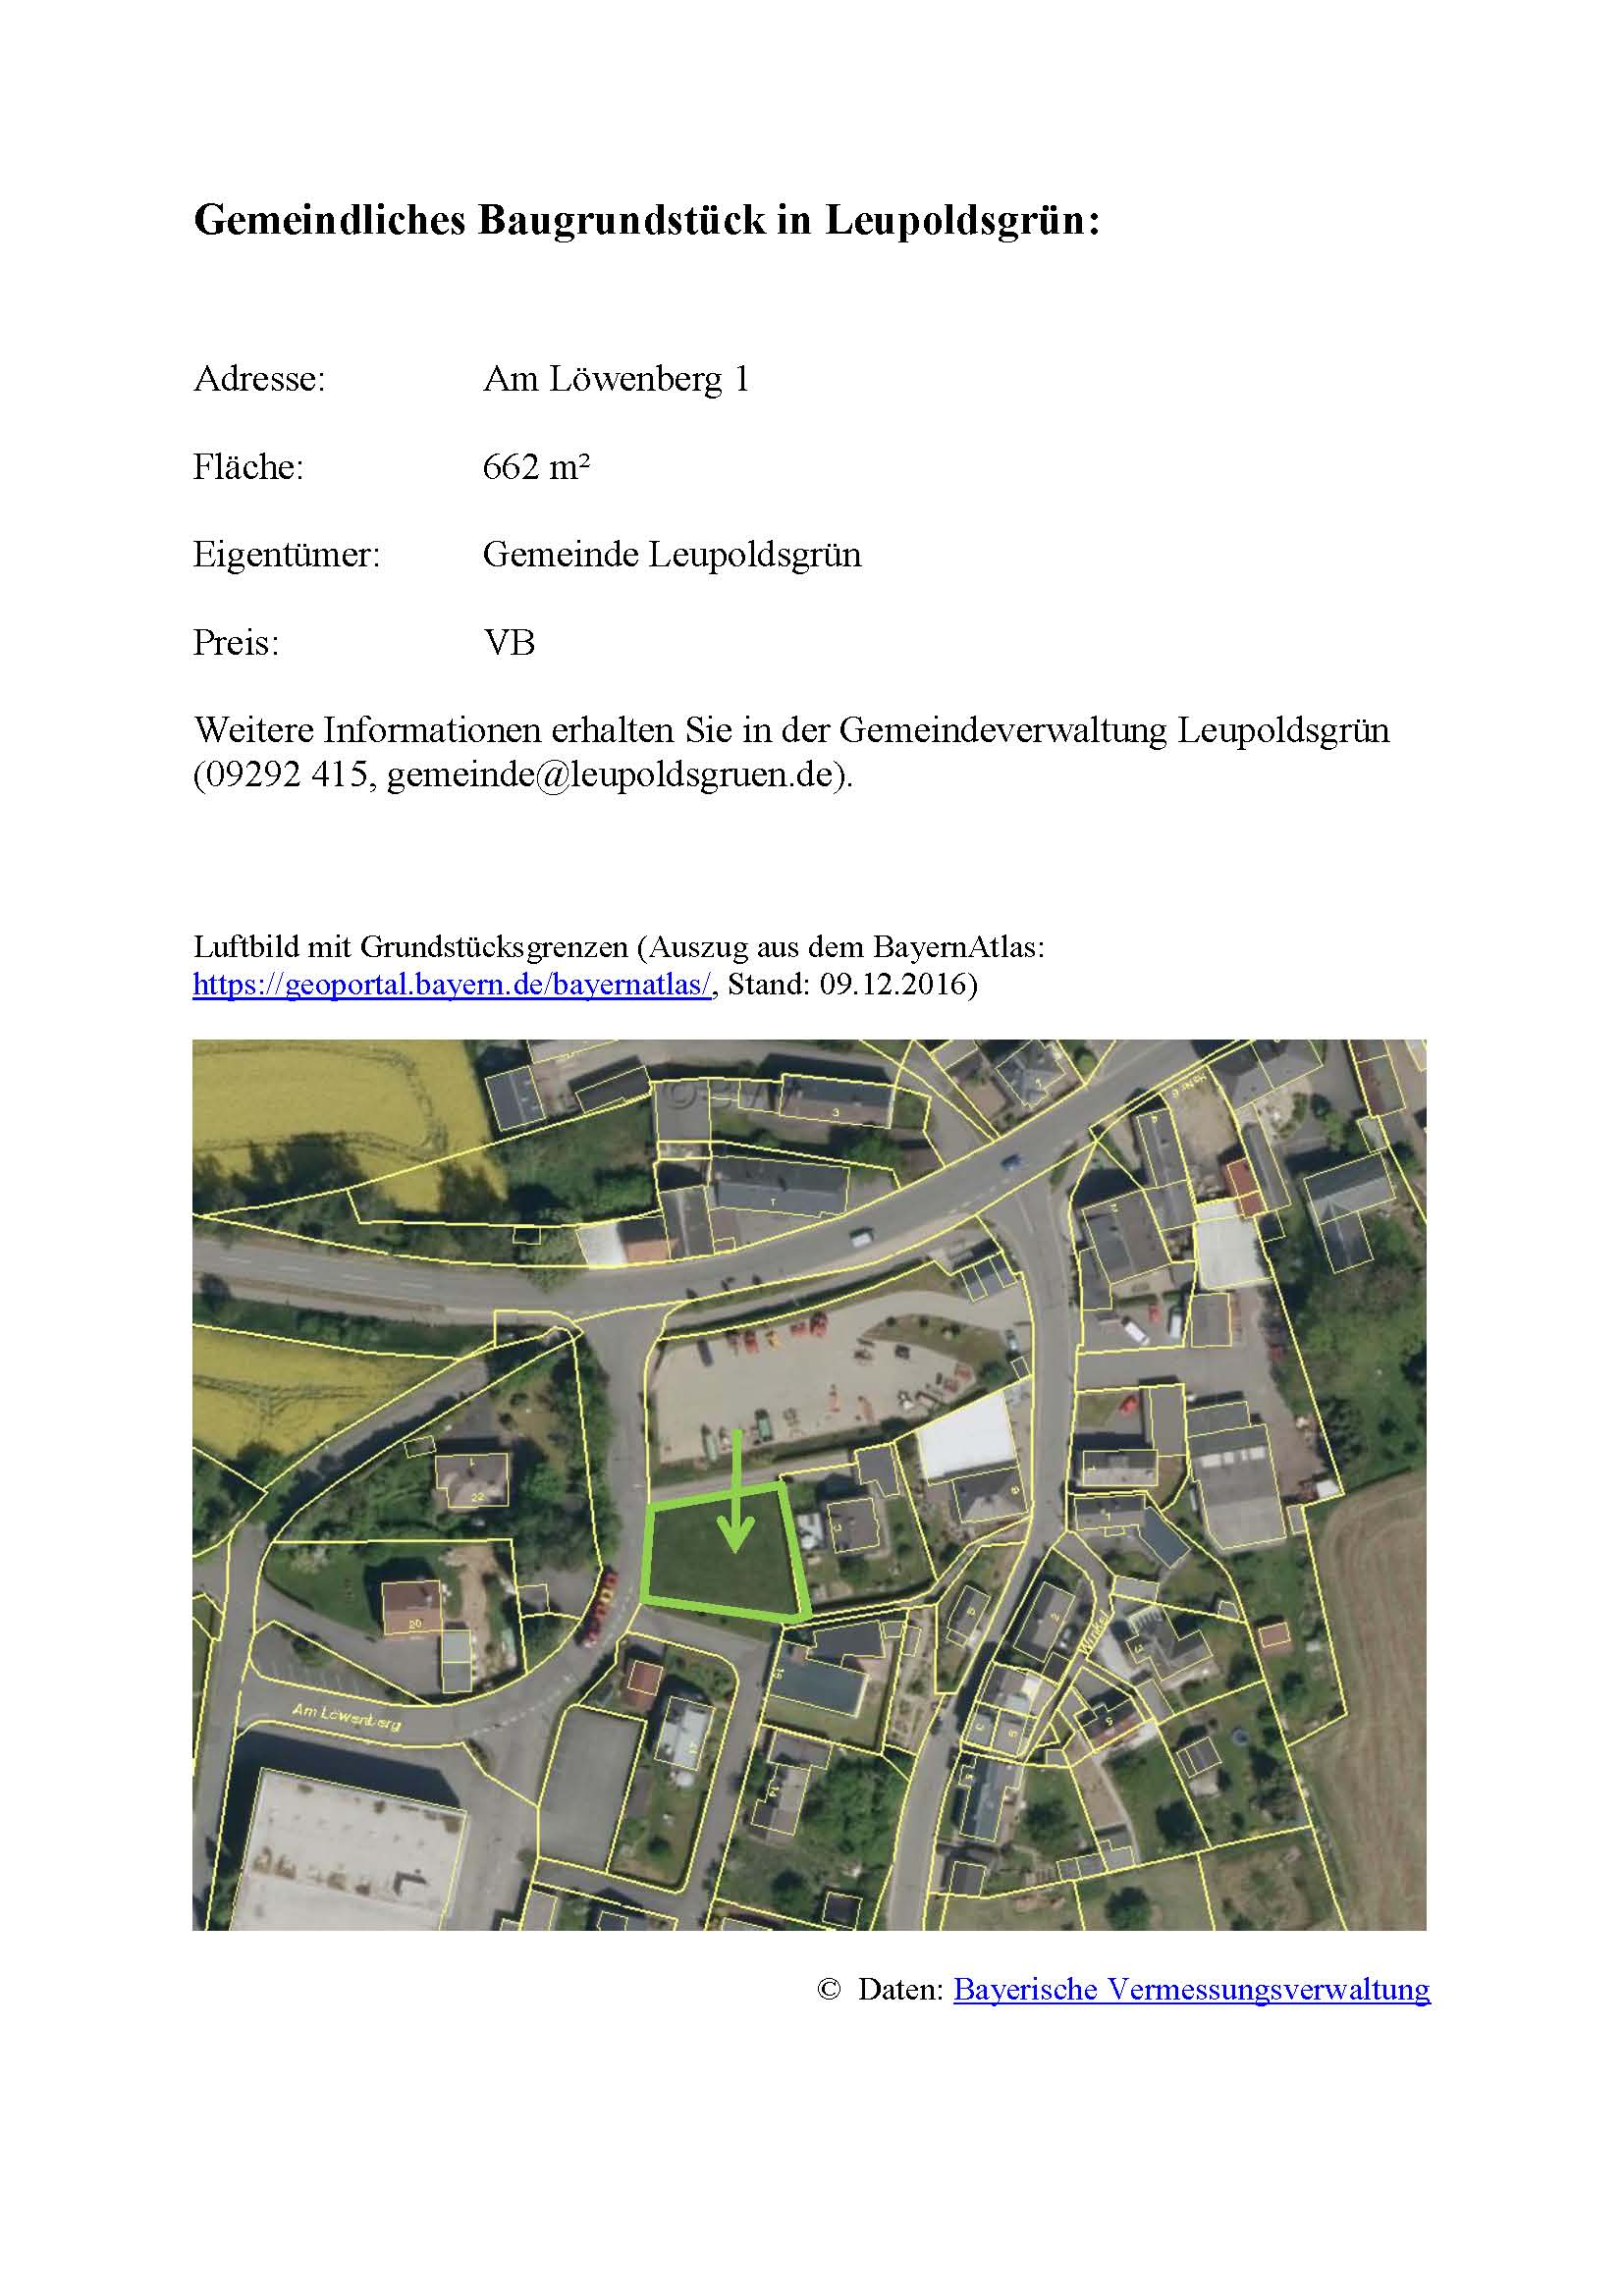 Baugrundstück Am Löwenberg 1